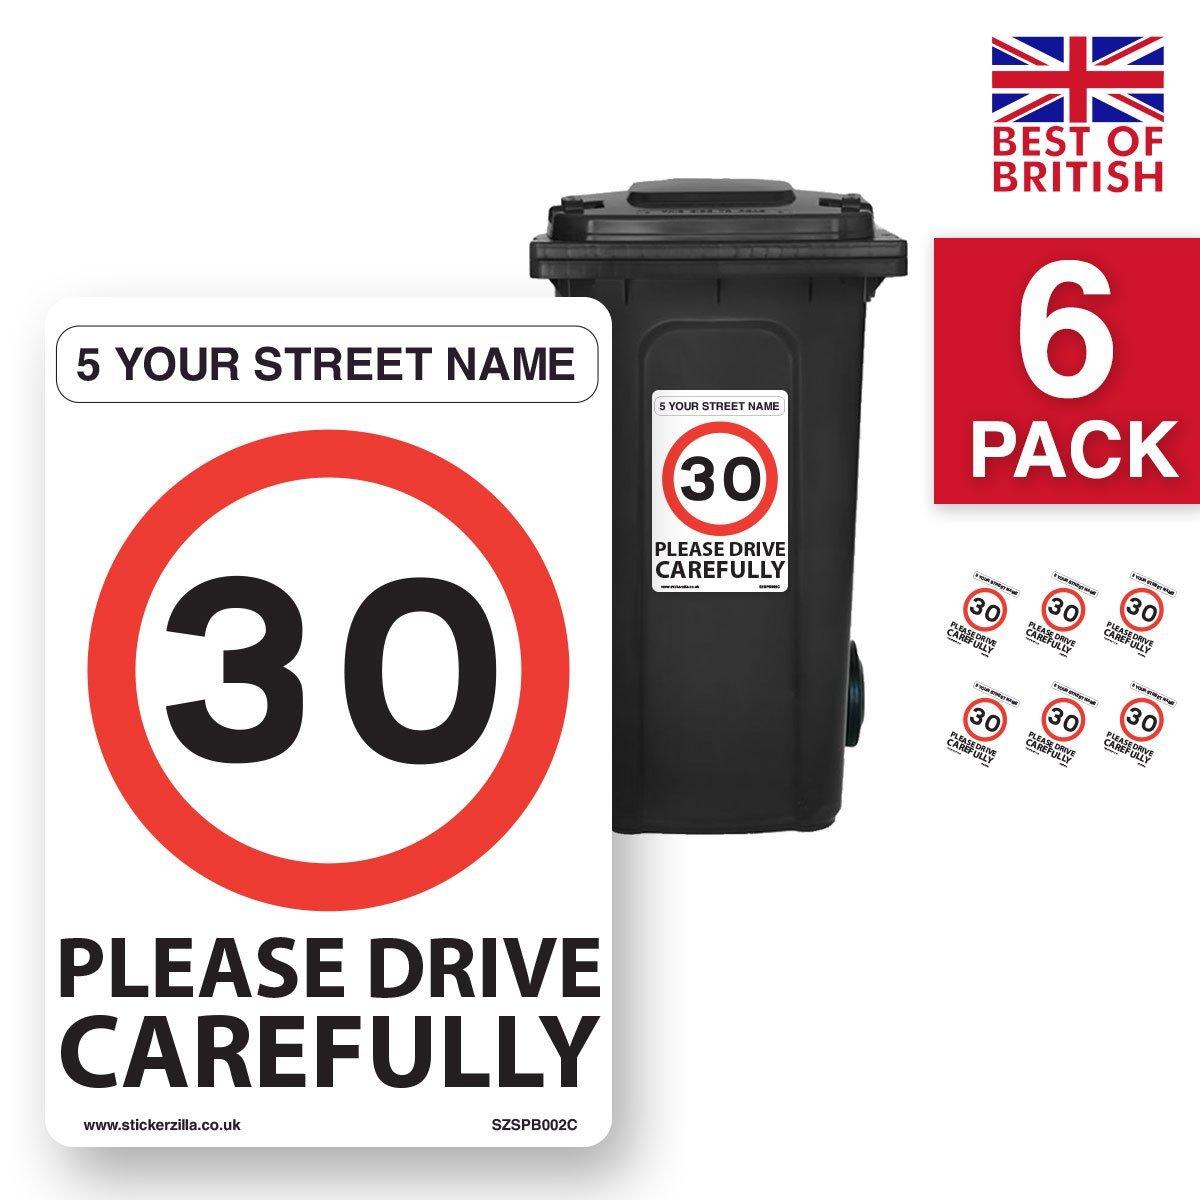 Custom address a4 wheelie bin vinyl stickers 30mph speed notice 6 x pack a4 200mm w x 300mm h white background